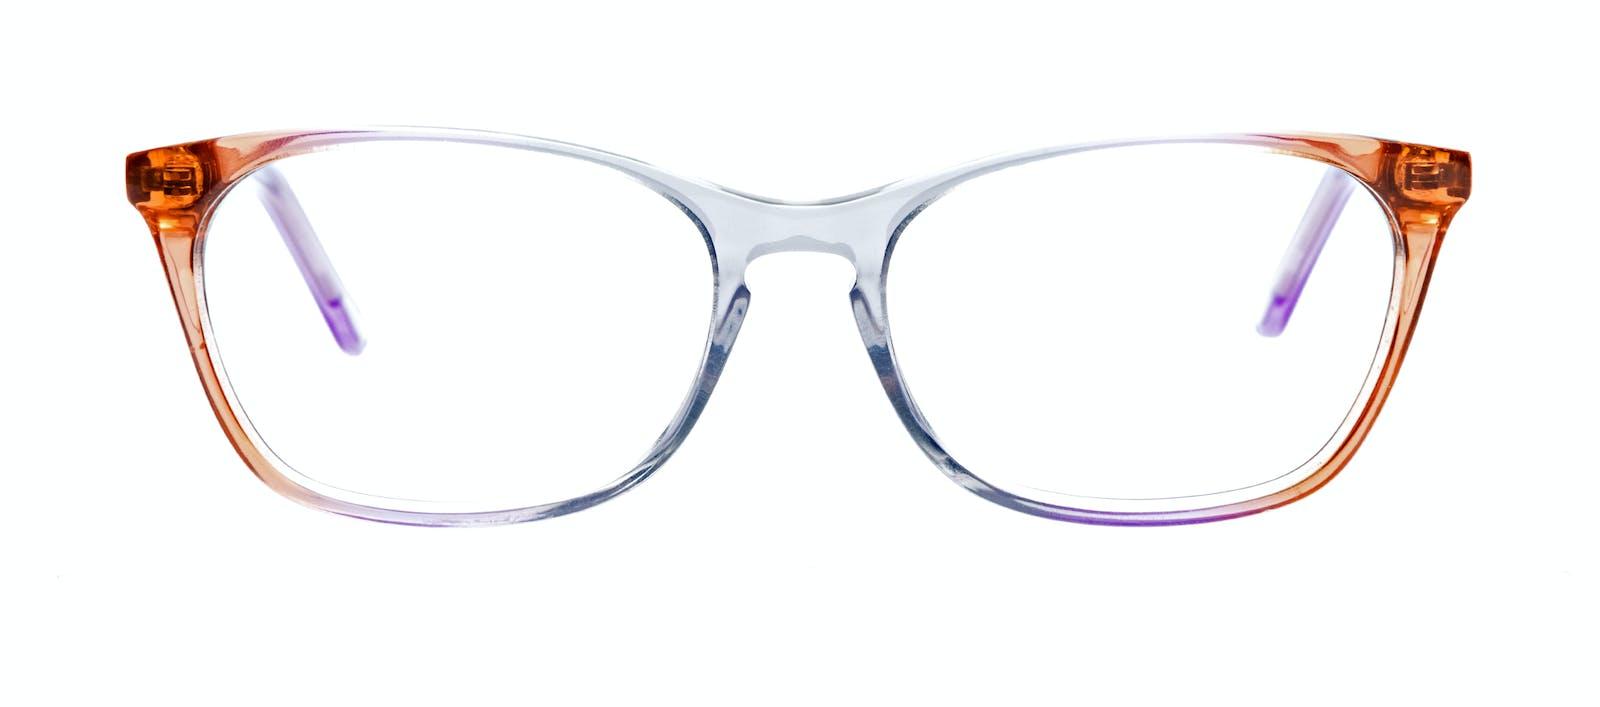 8b57433e1b0 ... Affordable Fashion Glasses Cat Eye Rectangle Eyeglasses Women Grace  Rainbow Haze Front ...